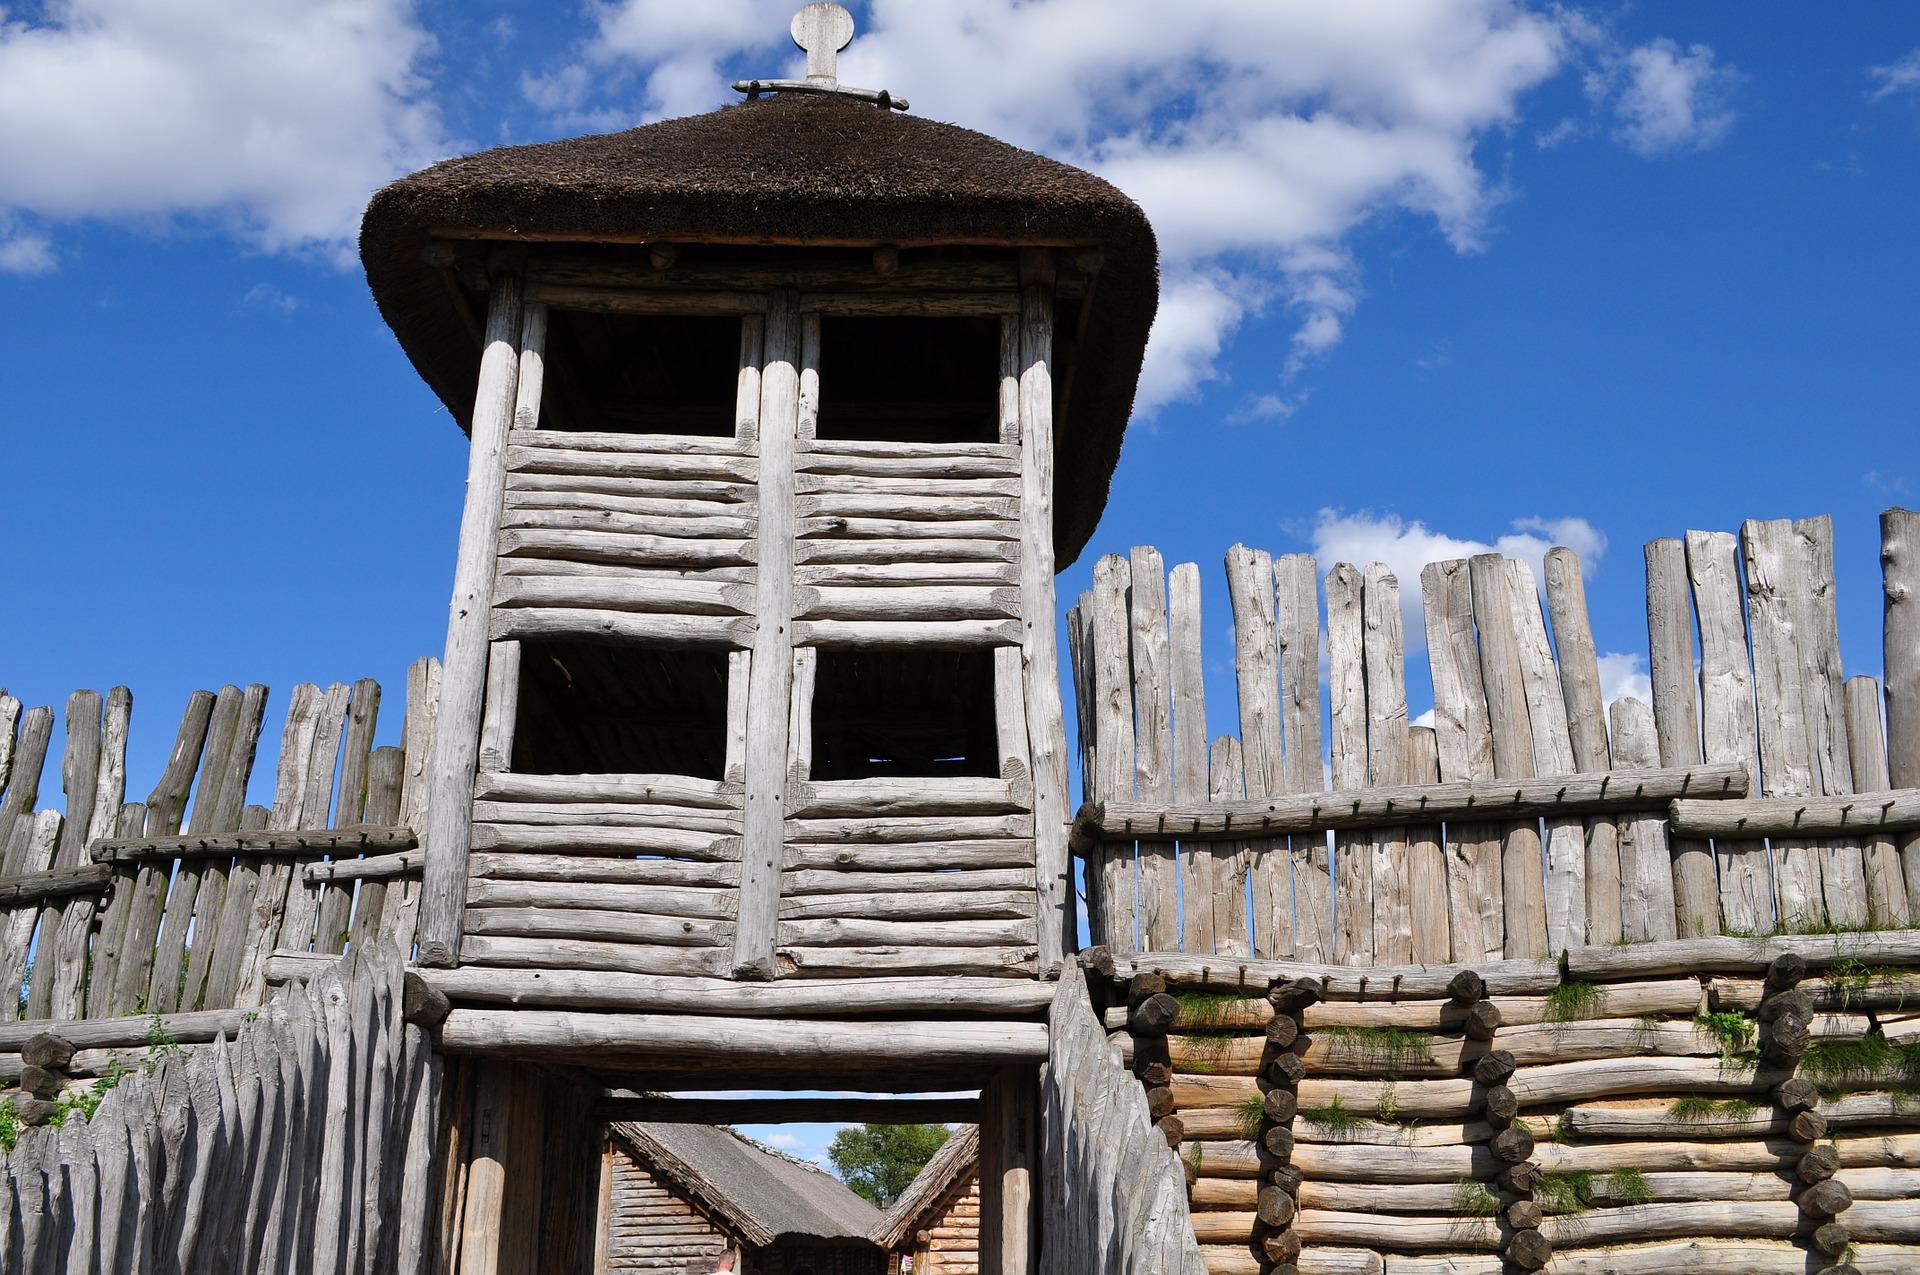 Biskupin Bronze Age Site Visit In Poland